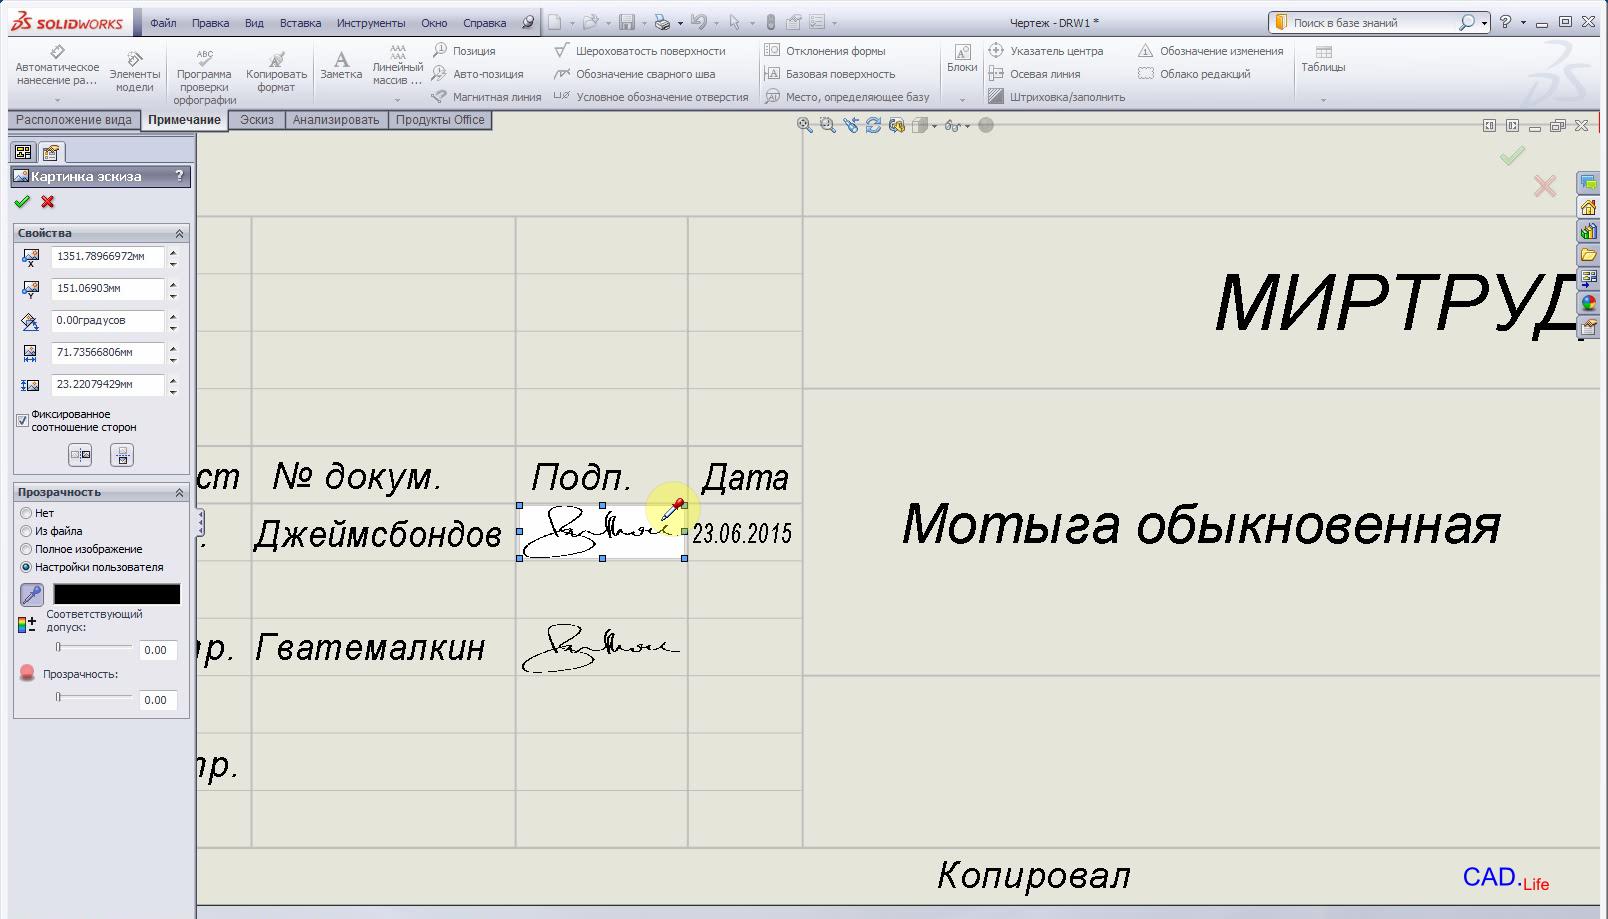 Рис.3. Настройка файла изображения в формате JPG